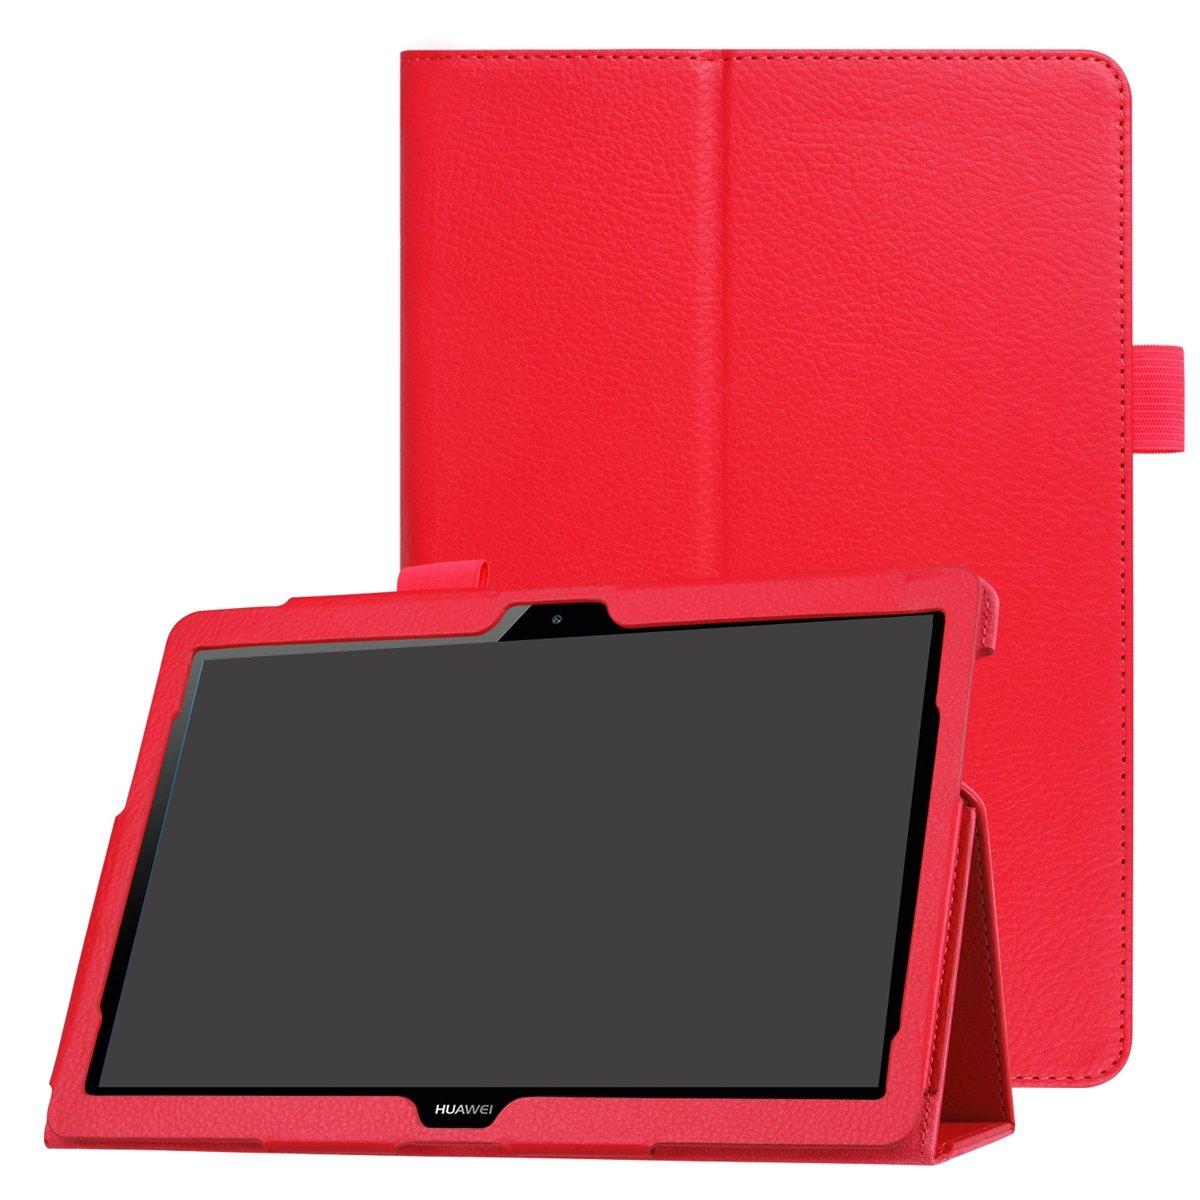 CaseFirst Huawei MediaPad T3 10.0 Case, [Portable Wallet ] [ Slim Fit ] Heavy Duty Protective Design Flip Cover Wallet Case for Huawei MediaPad T3 10.0 - Pink 391O-A0-798